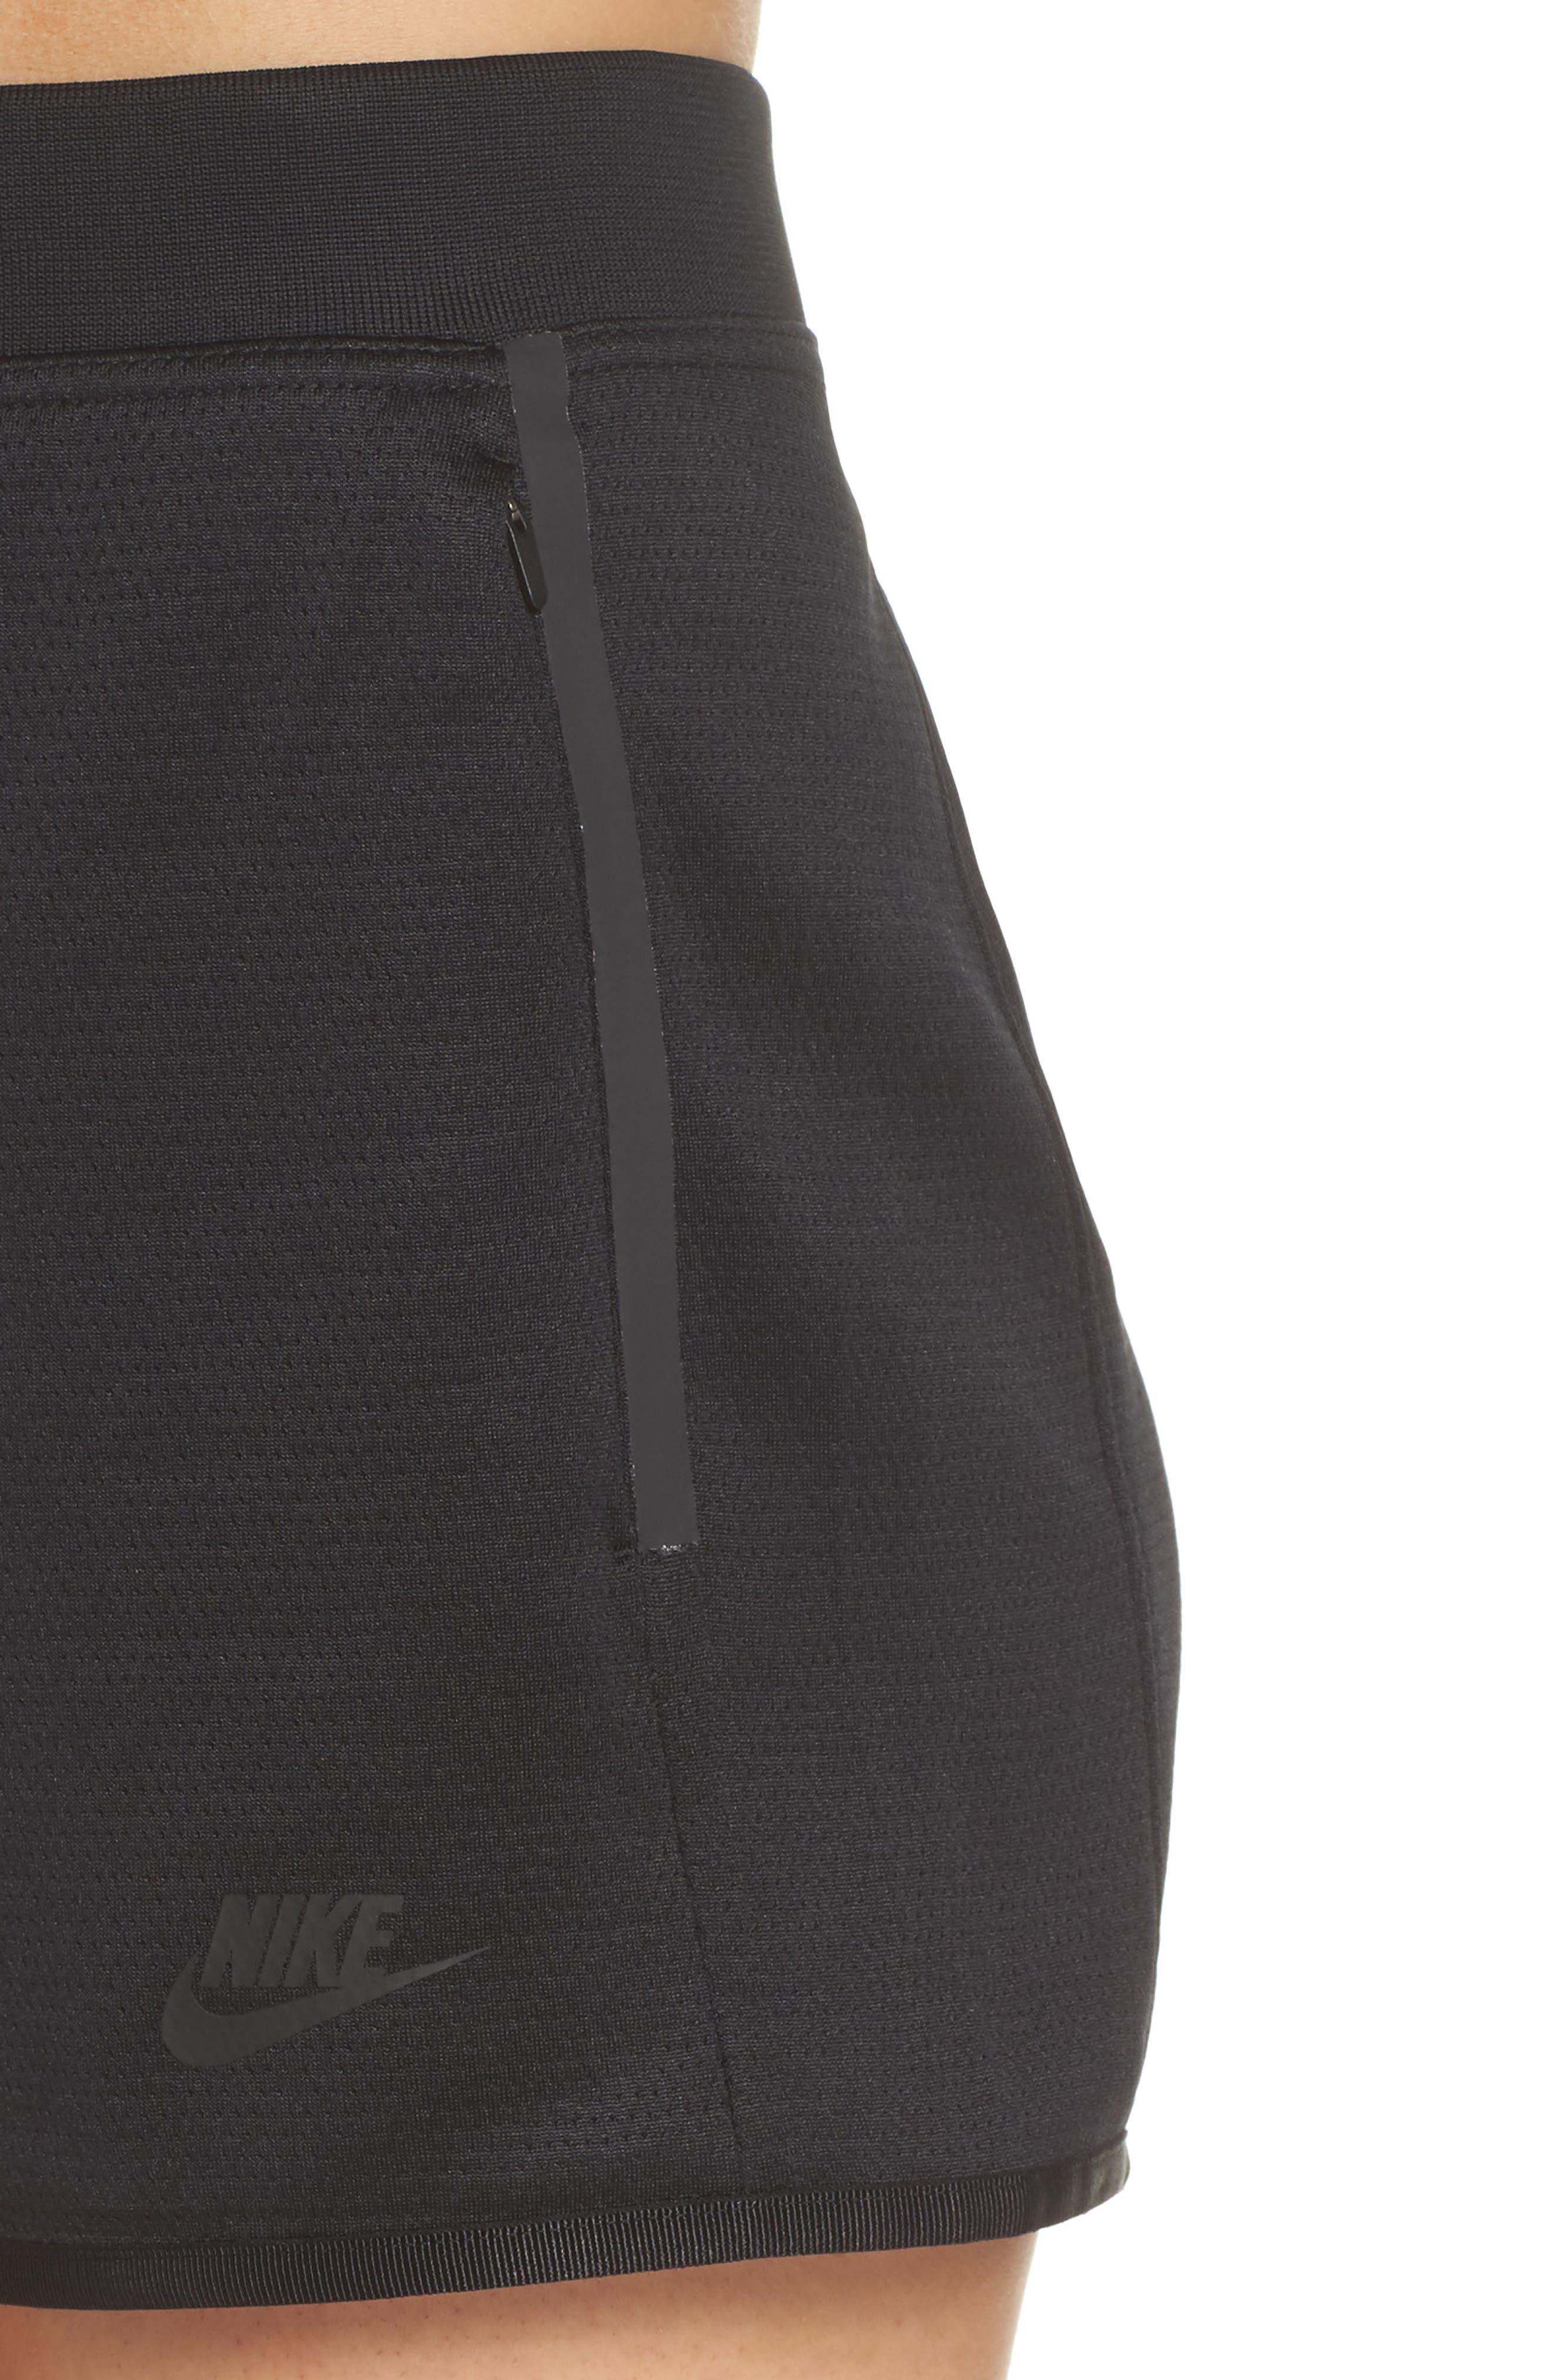 Sportswear Tech Fleece Short,                             Alternate thumbnail 4, color,                             010